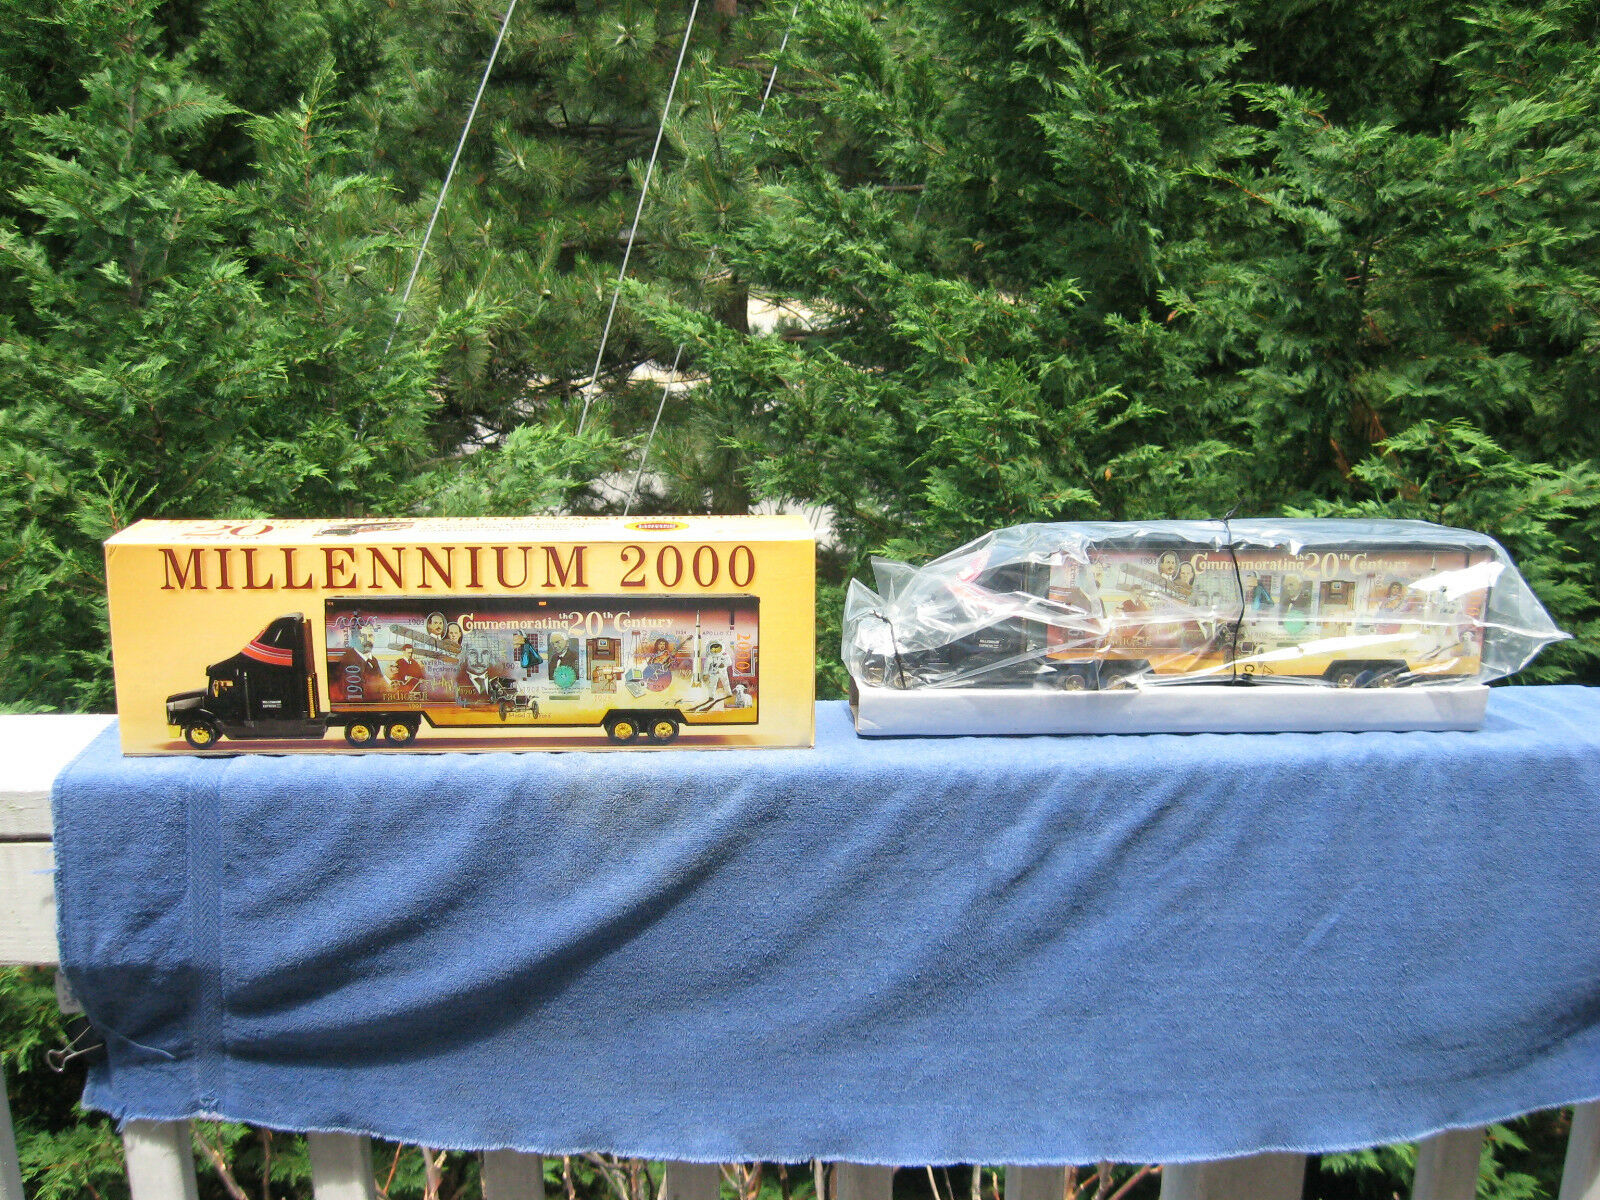 Millennium 2000 Commemorating The 20Th Century Semi & TrailerNew